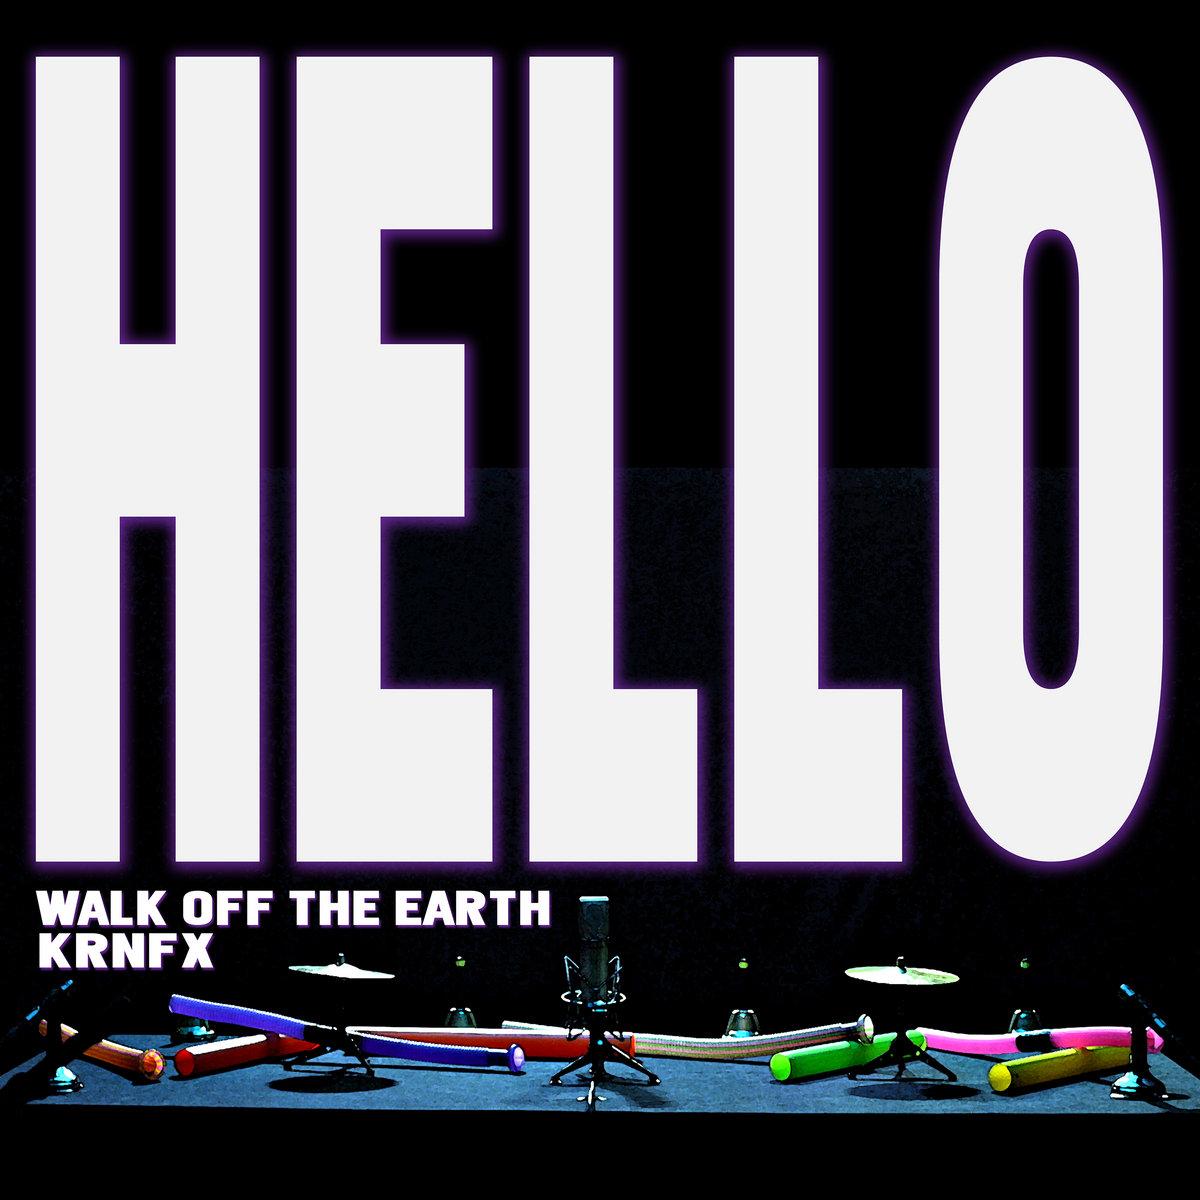 walk off the earth album download free